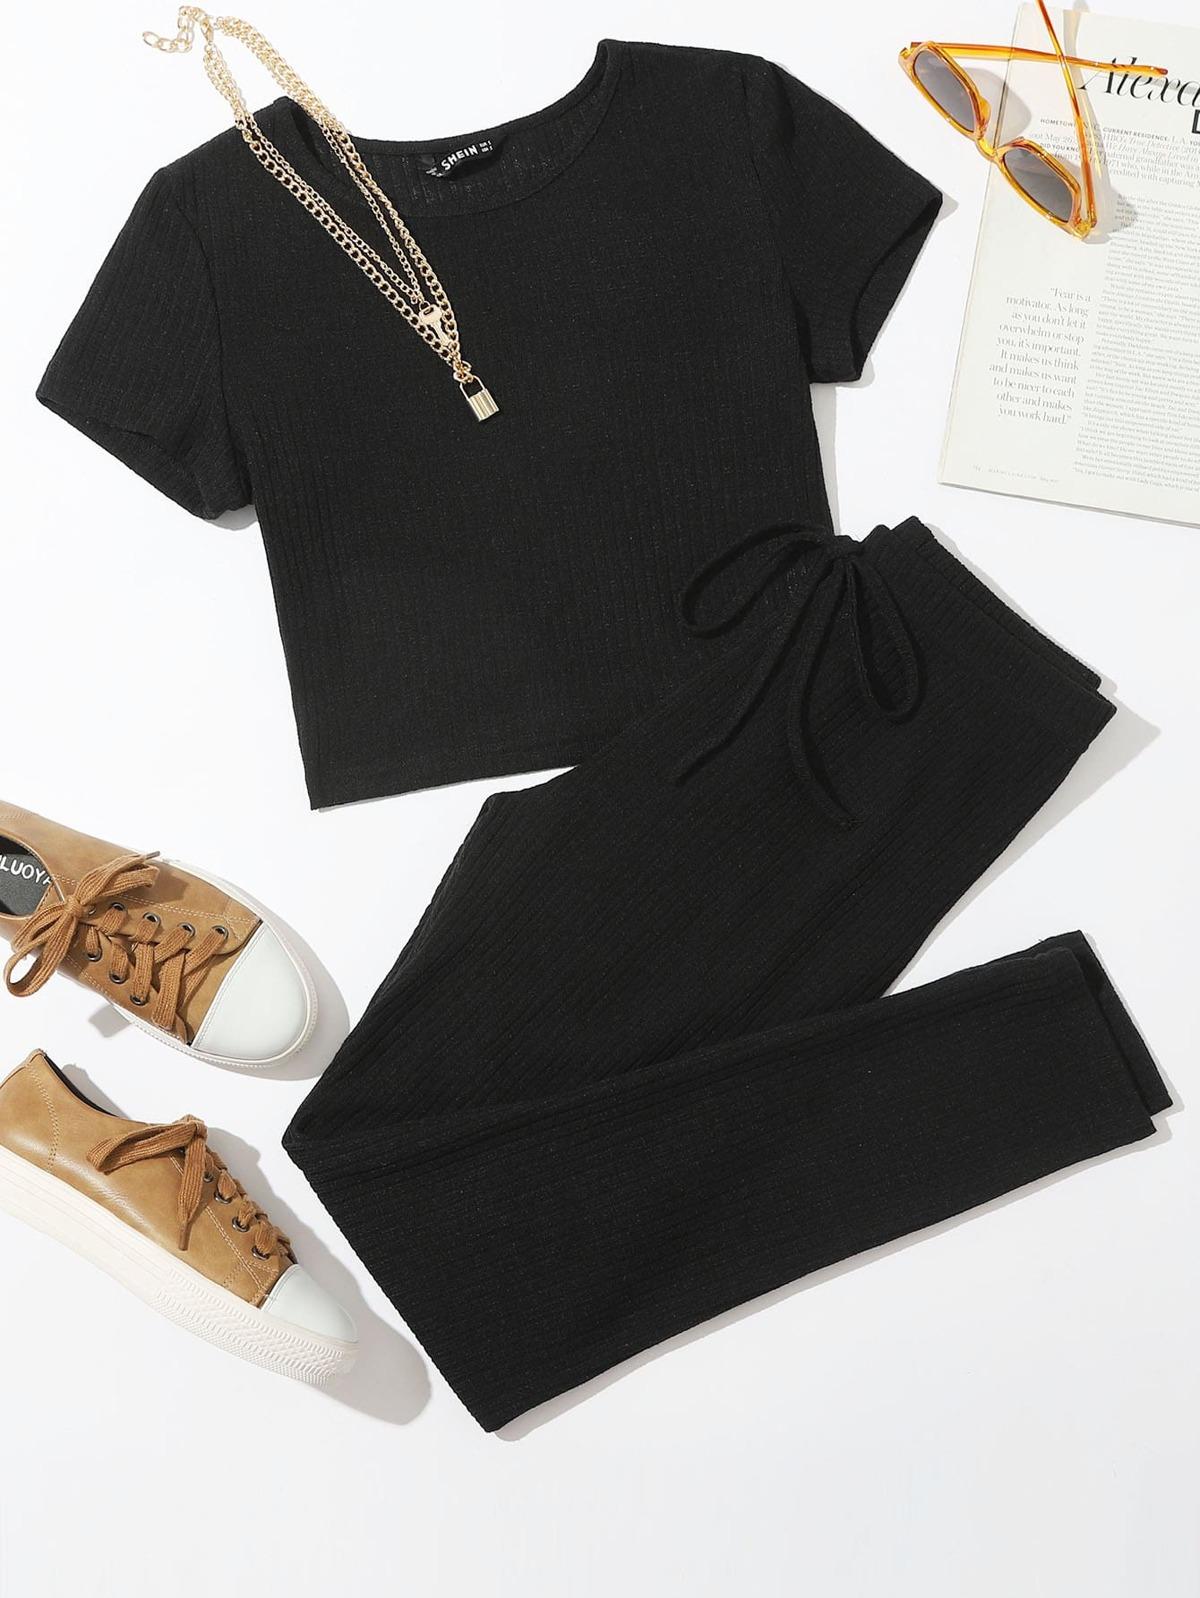 Solid Rib-knit Tee & Tie Waist Pants Set